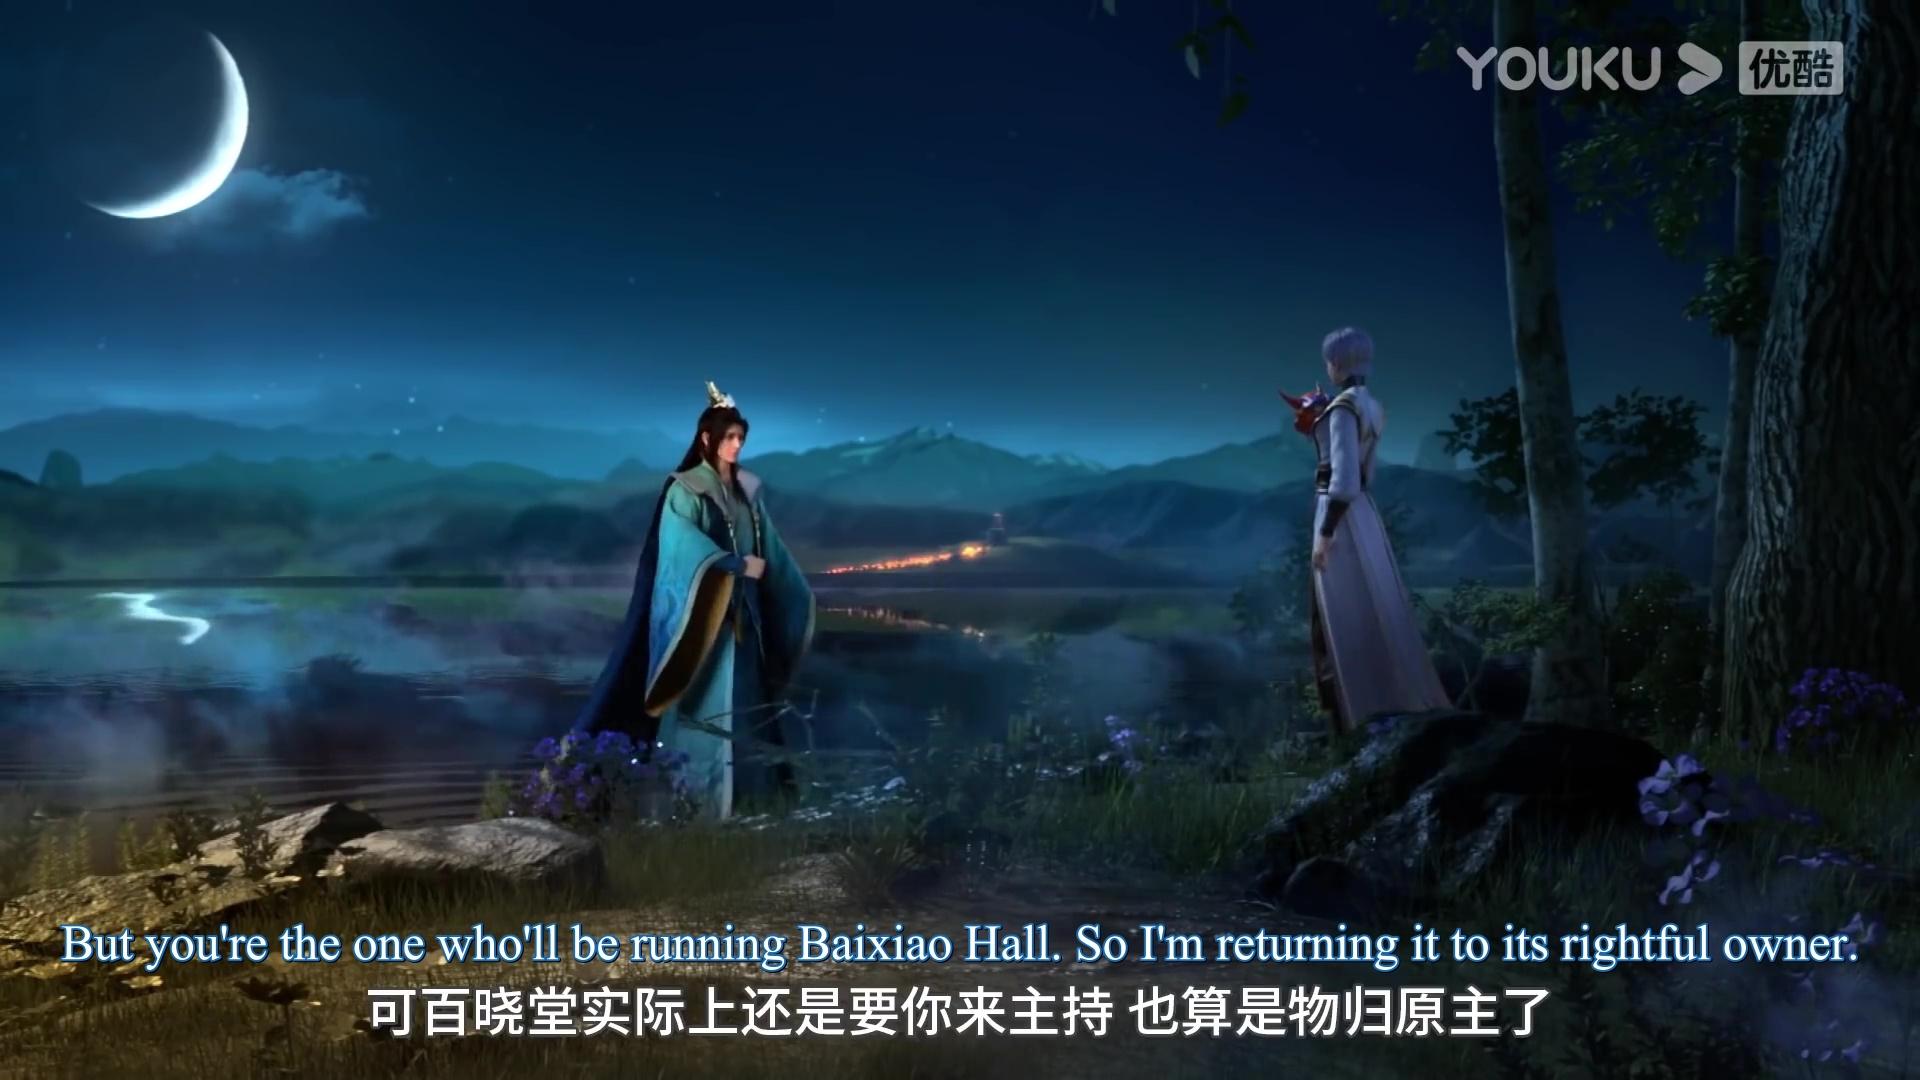 Shao Nian Ge Xing - Great Journey of Teenagers episode 27 english sub